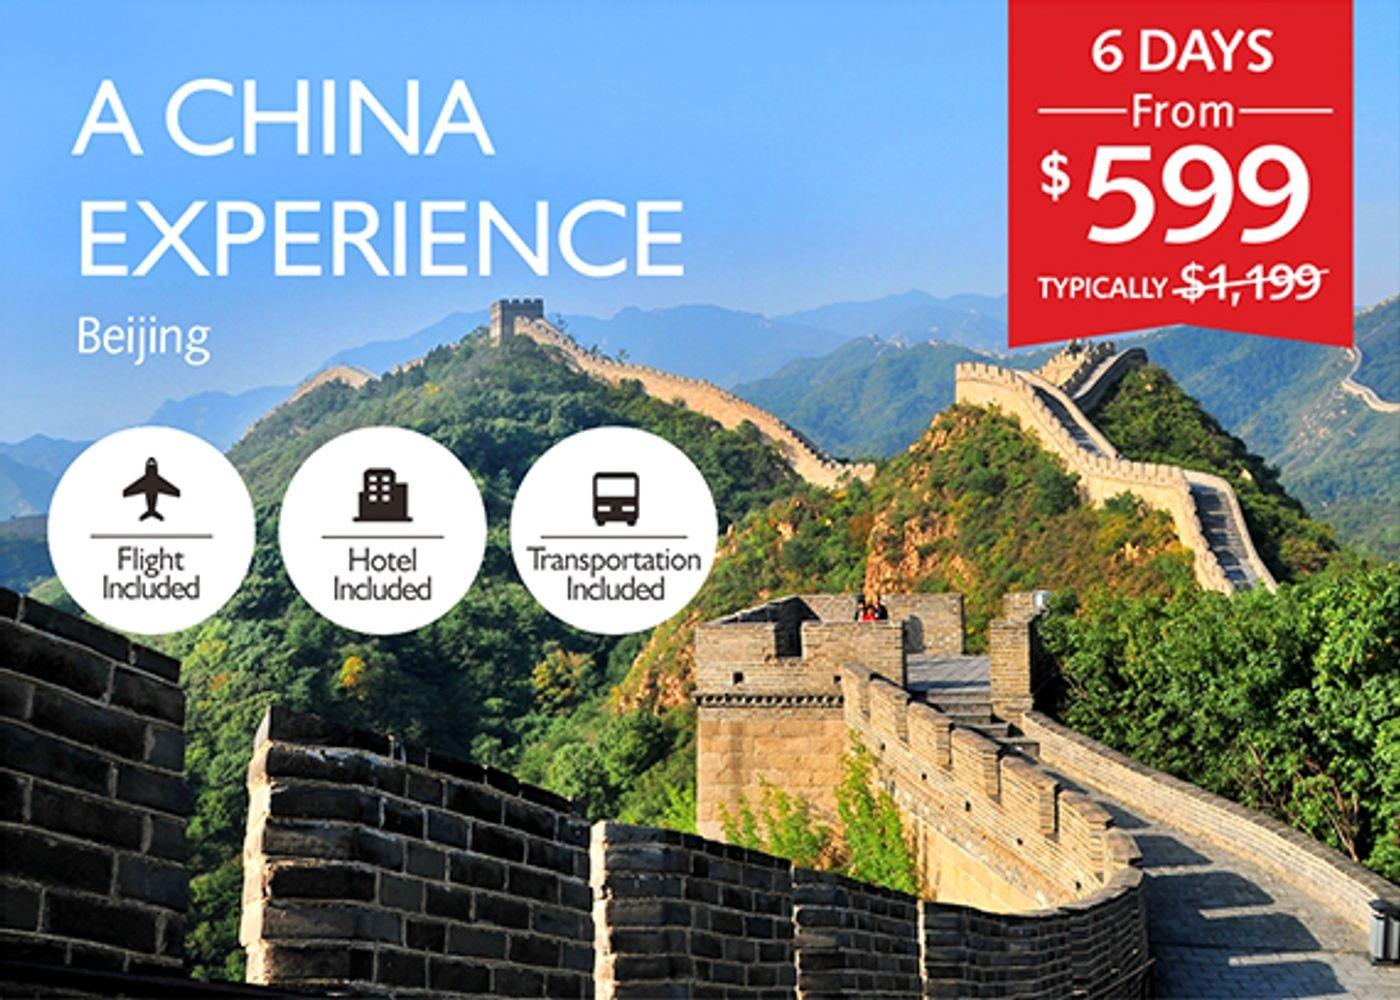 A China Experience (TravelZoo)